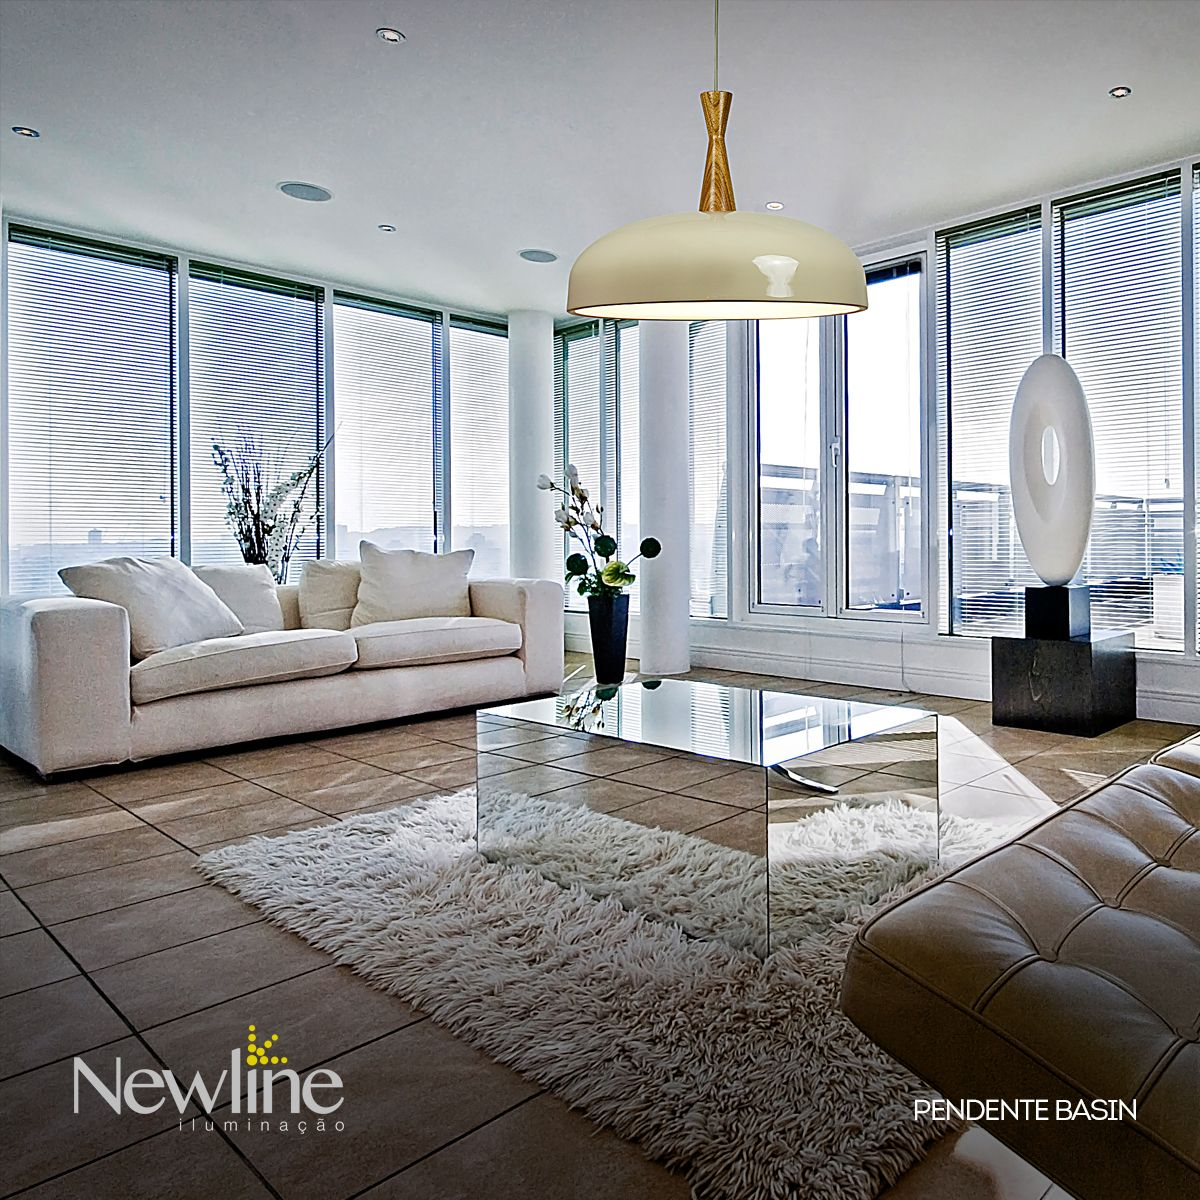 Pendente Basin Projeto Ilumina O Para Sala De Estar Produto  # Muebles Personalizados Bujalance